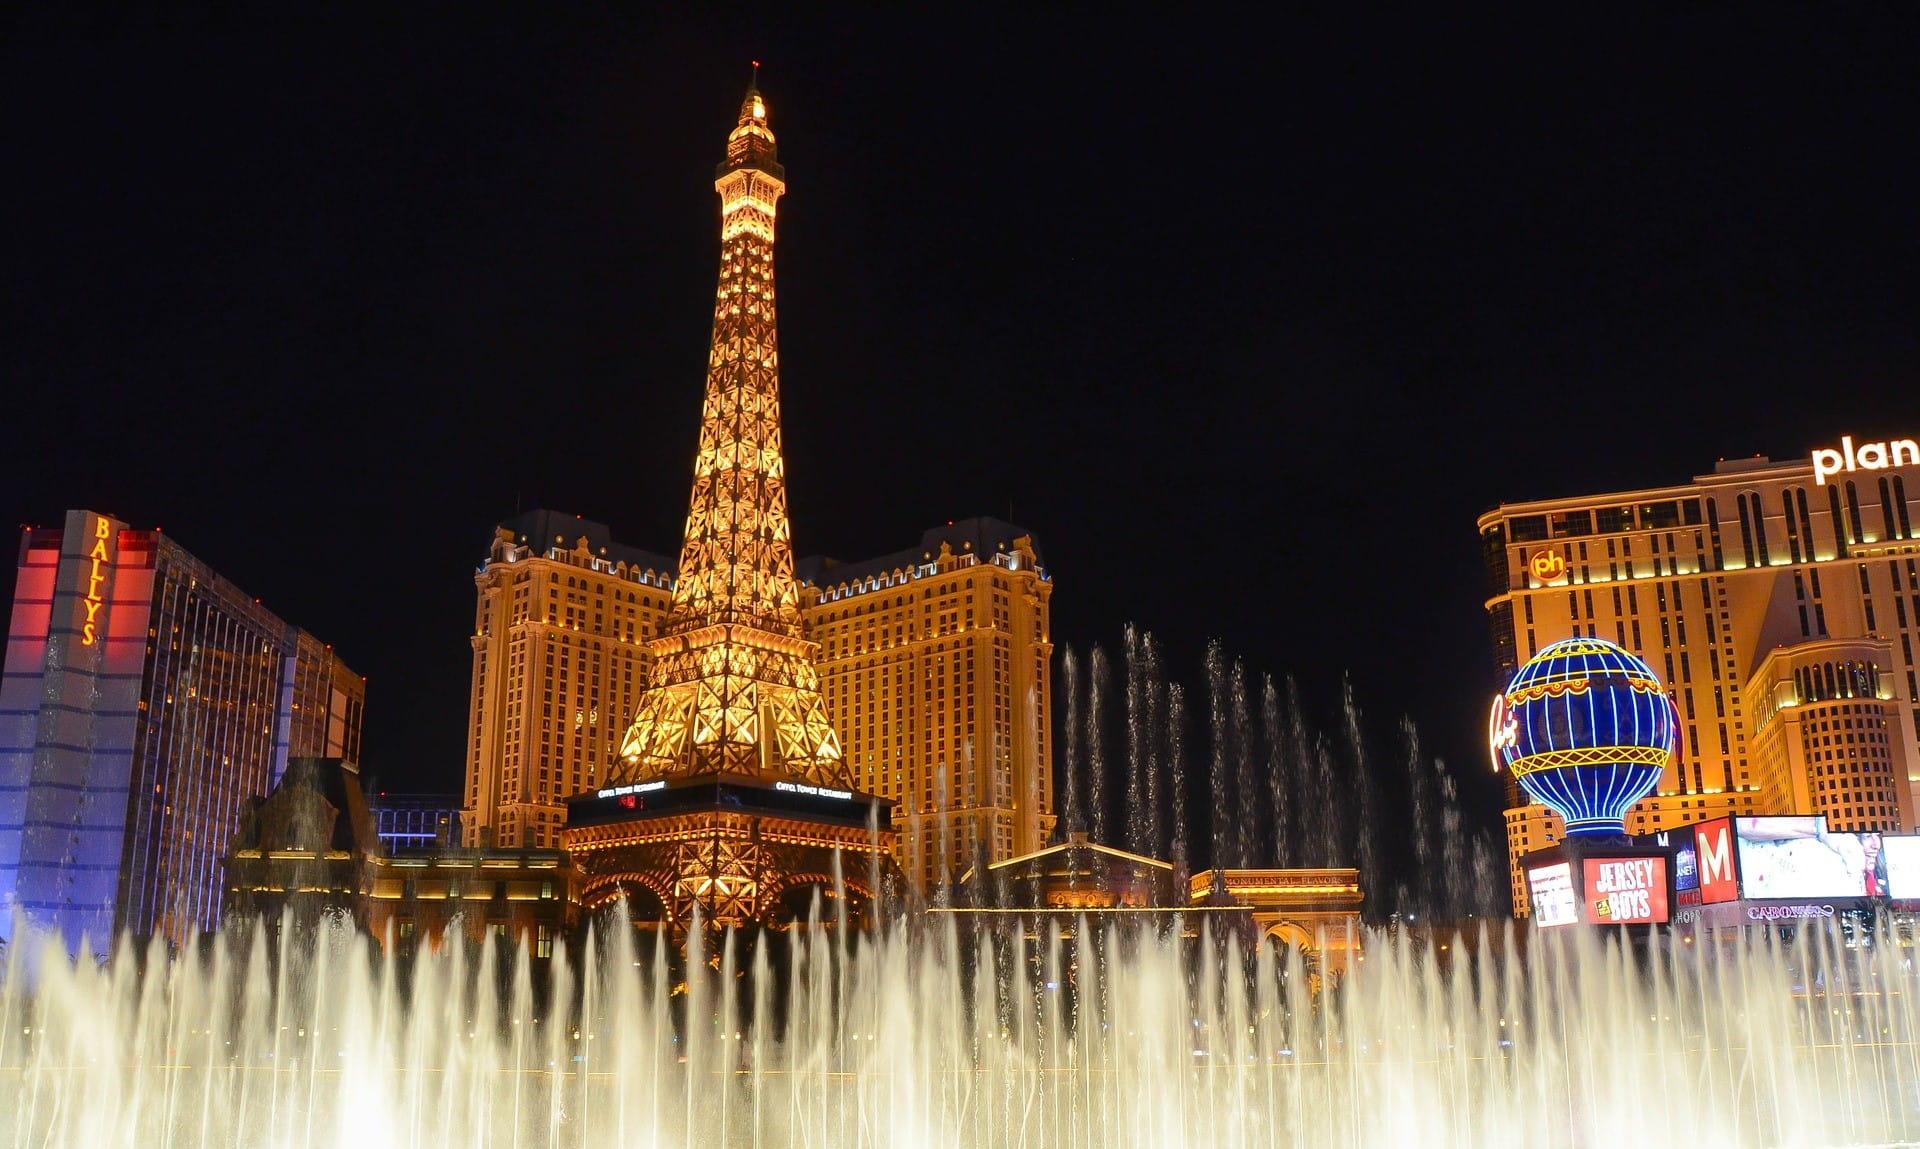 Las Vegas di malam hari - ada air mancur menyelam di latar depan dan kasino di latar belakang.